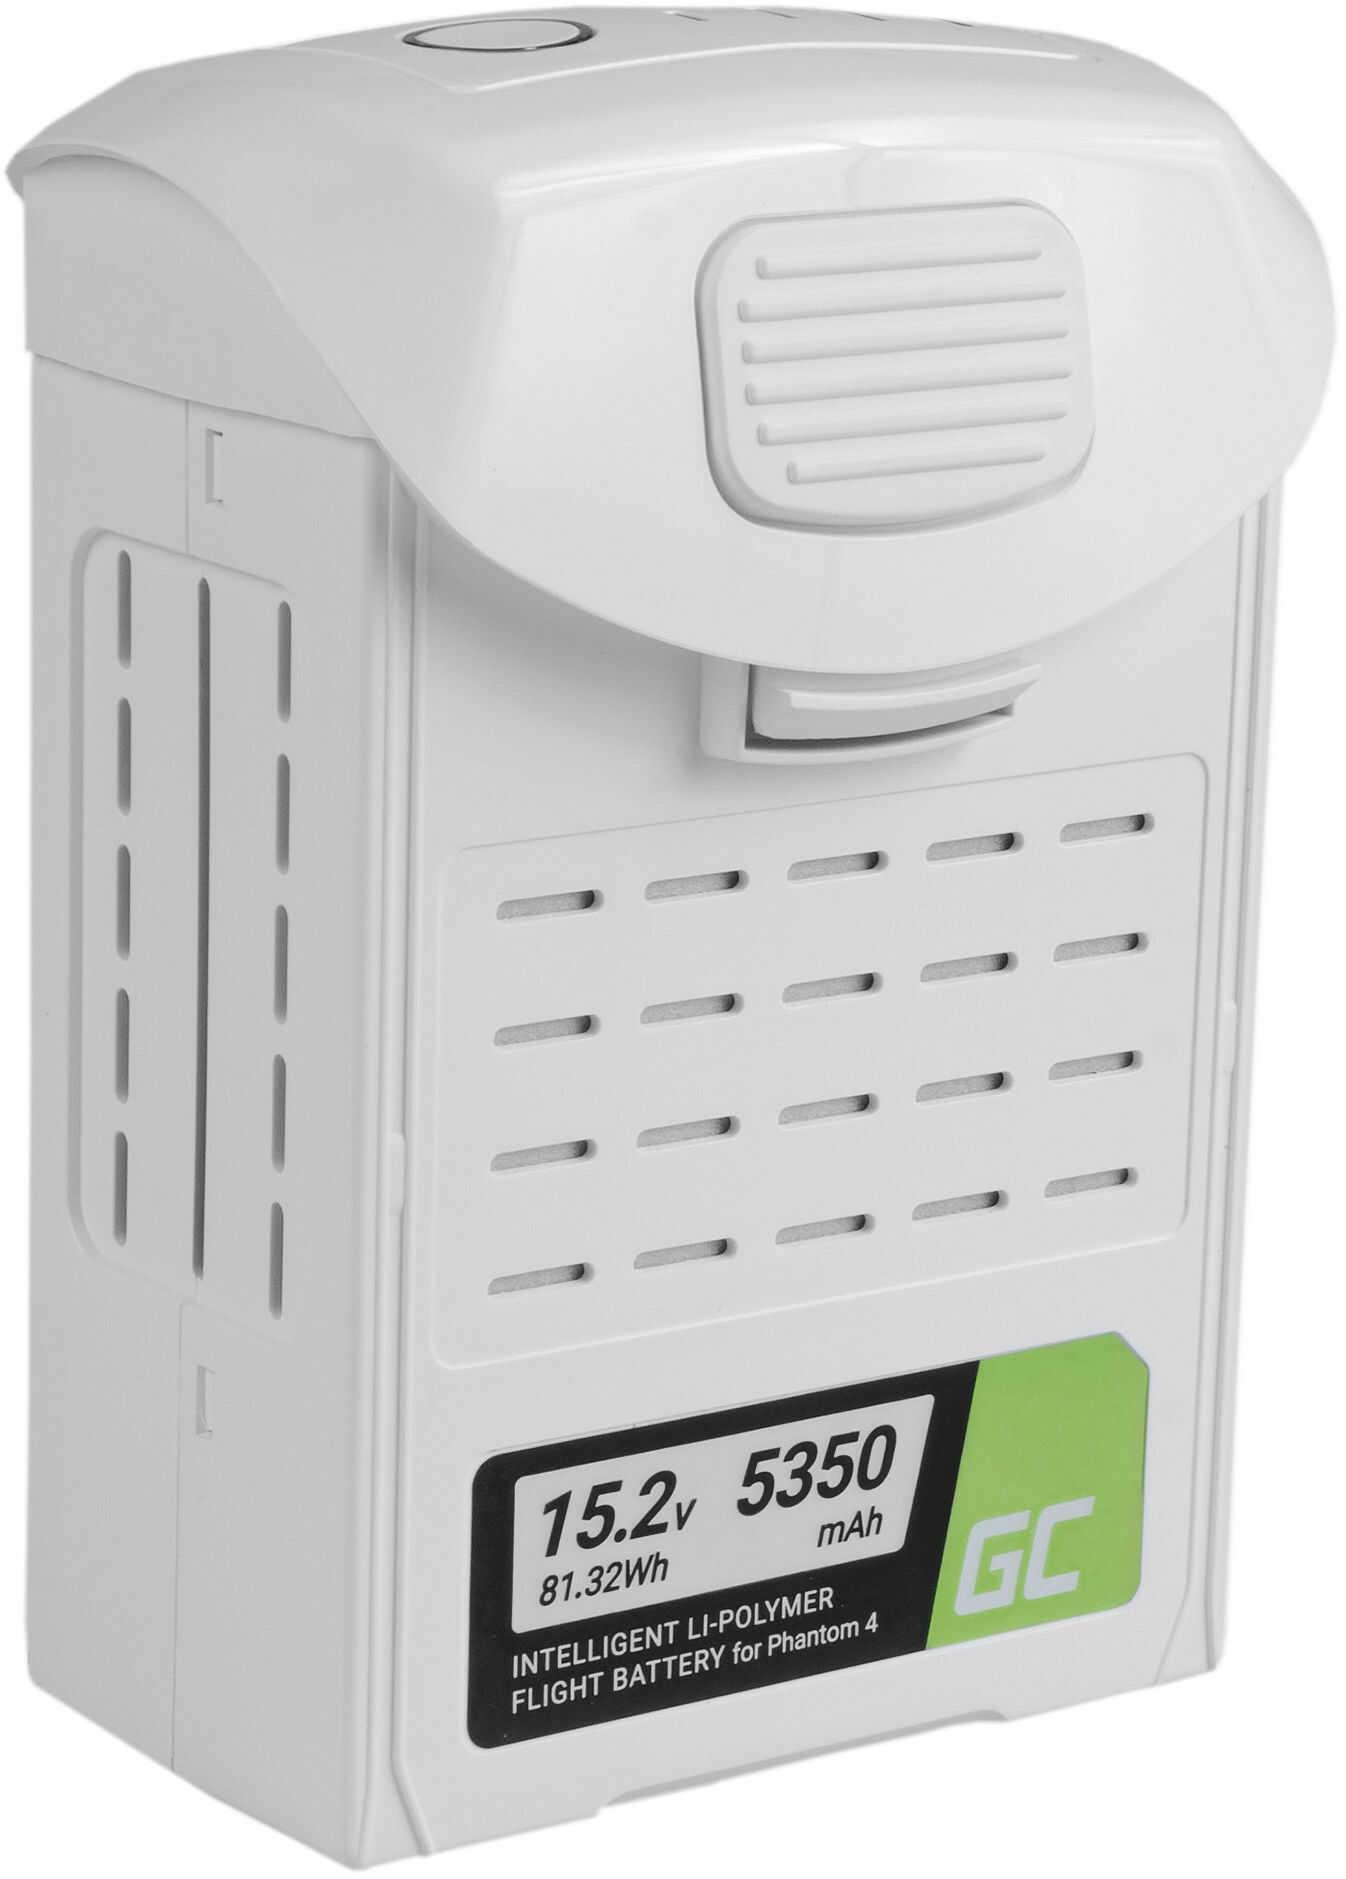 Bateria Akumulator Green Cell do drona DJI Phantom 4, Phantom 4 Pro, Phantom 4 Pro+ 15.2V 5350mAh 81.32Wh